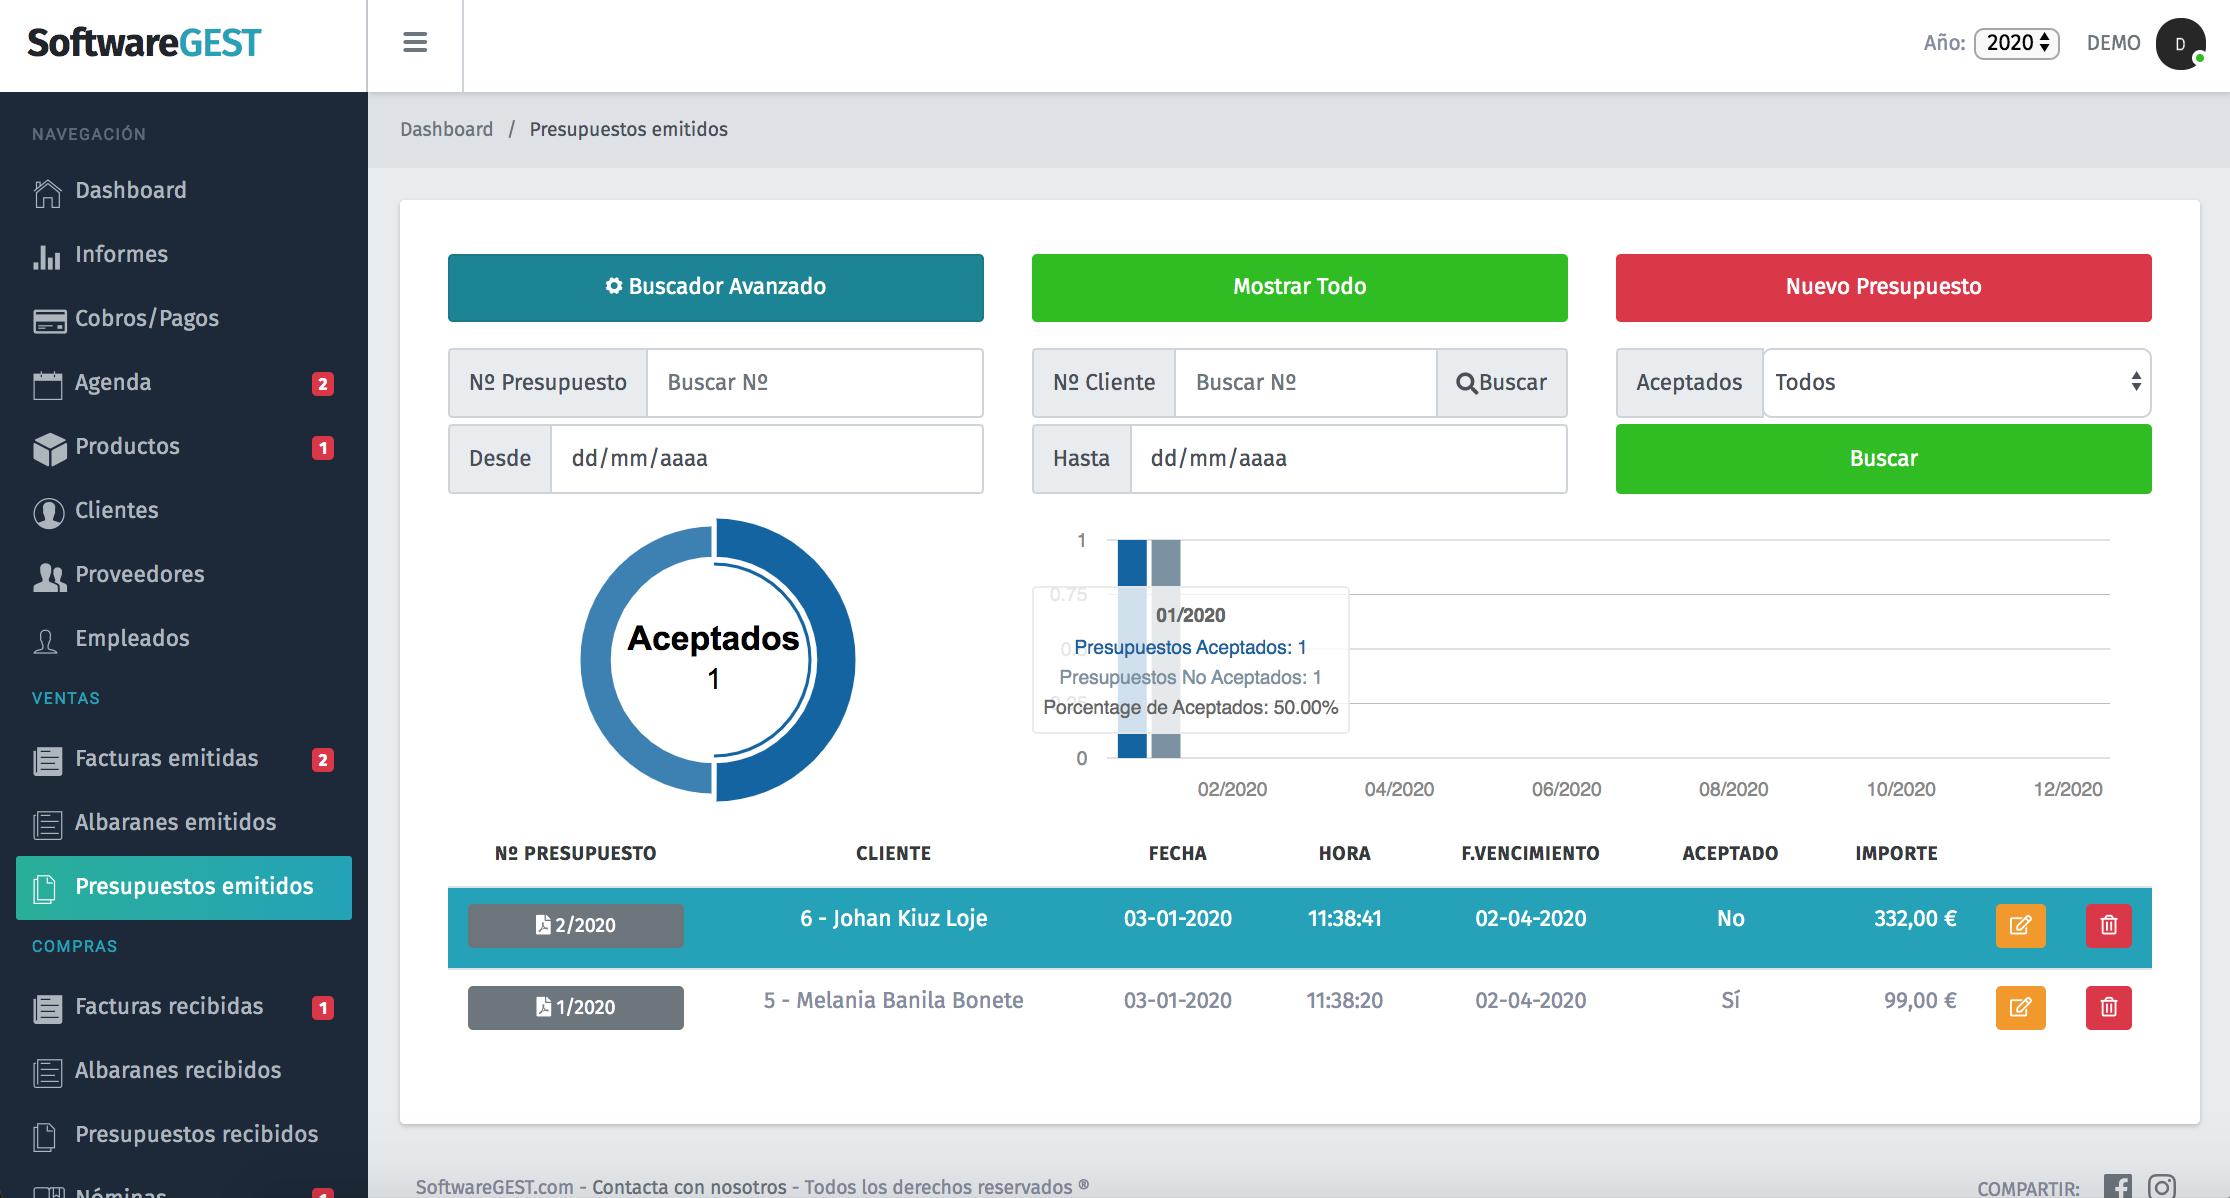 SoftwareGEST presupuestos emitidos filtro